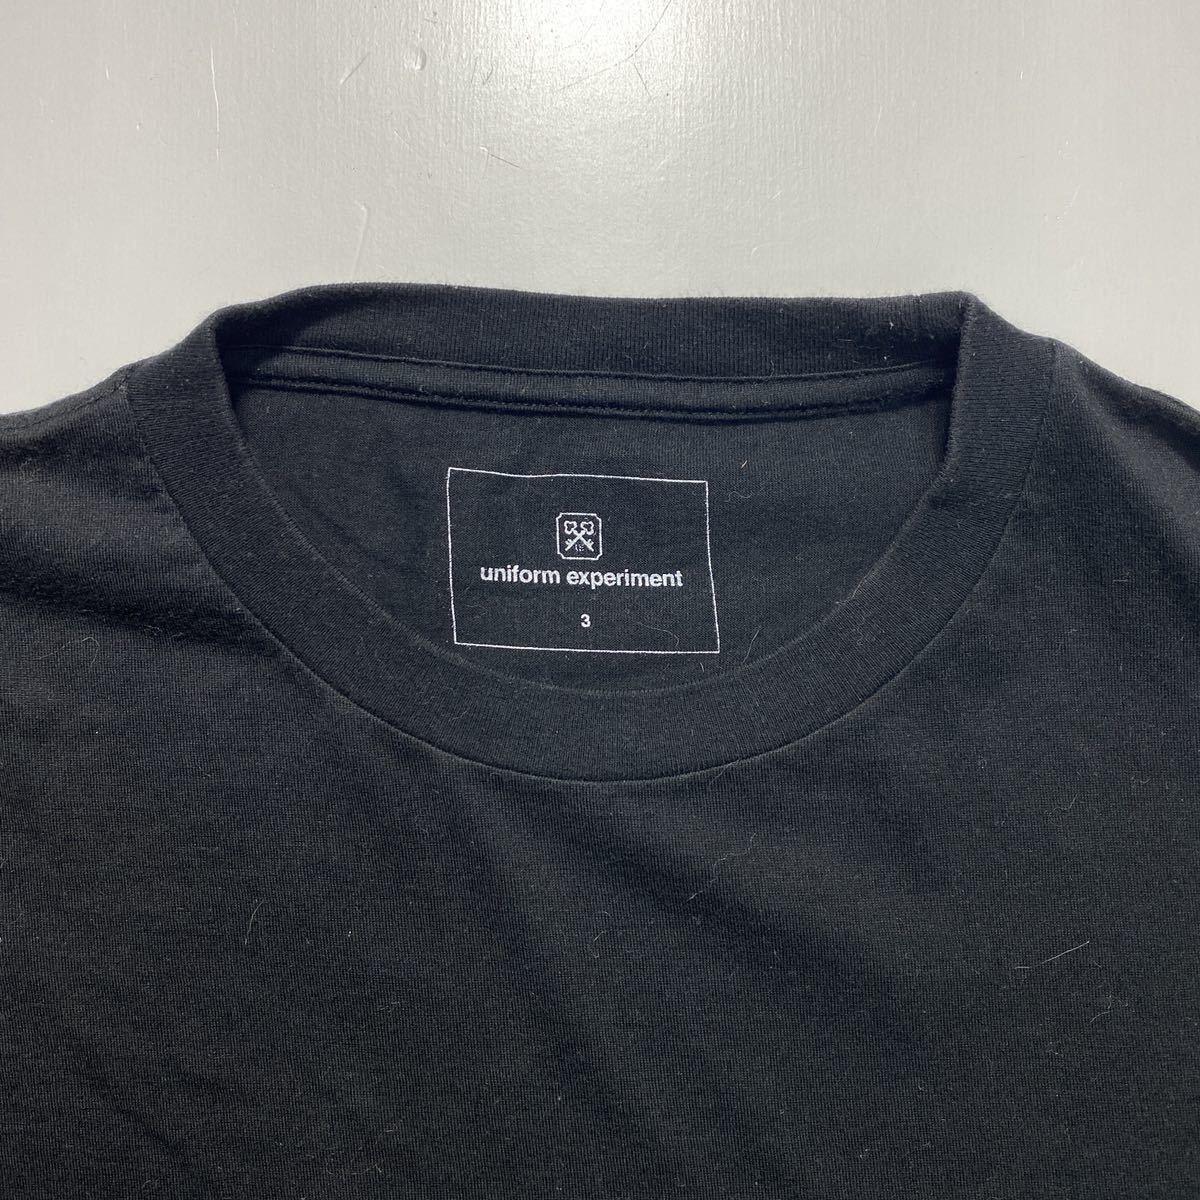 【3】uniform experiment Fragment design Tee ユニフォーム エクスペリメント フラグメントデザイン Tシャツ ブラック G485_画像3